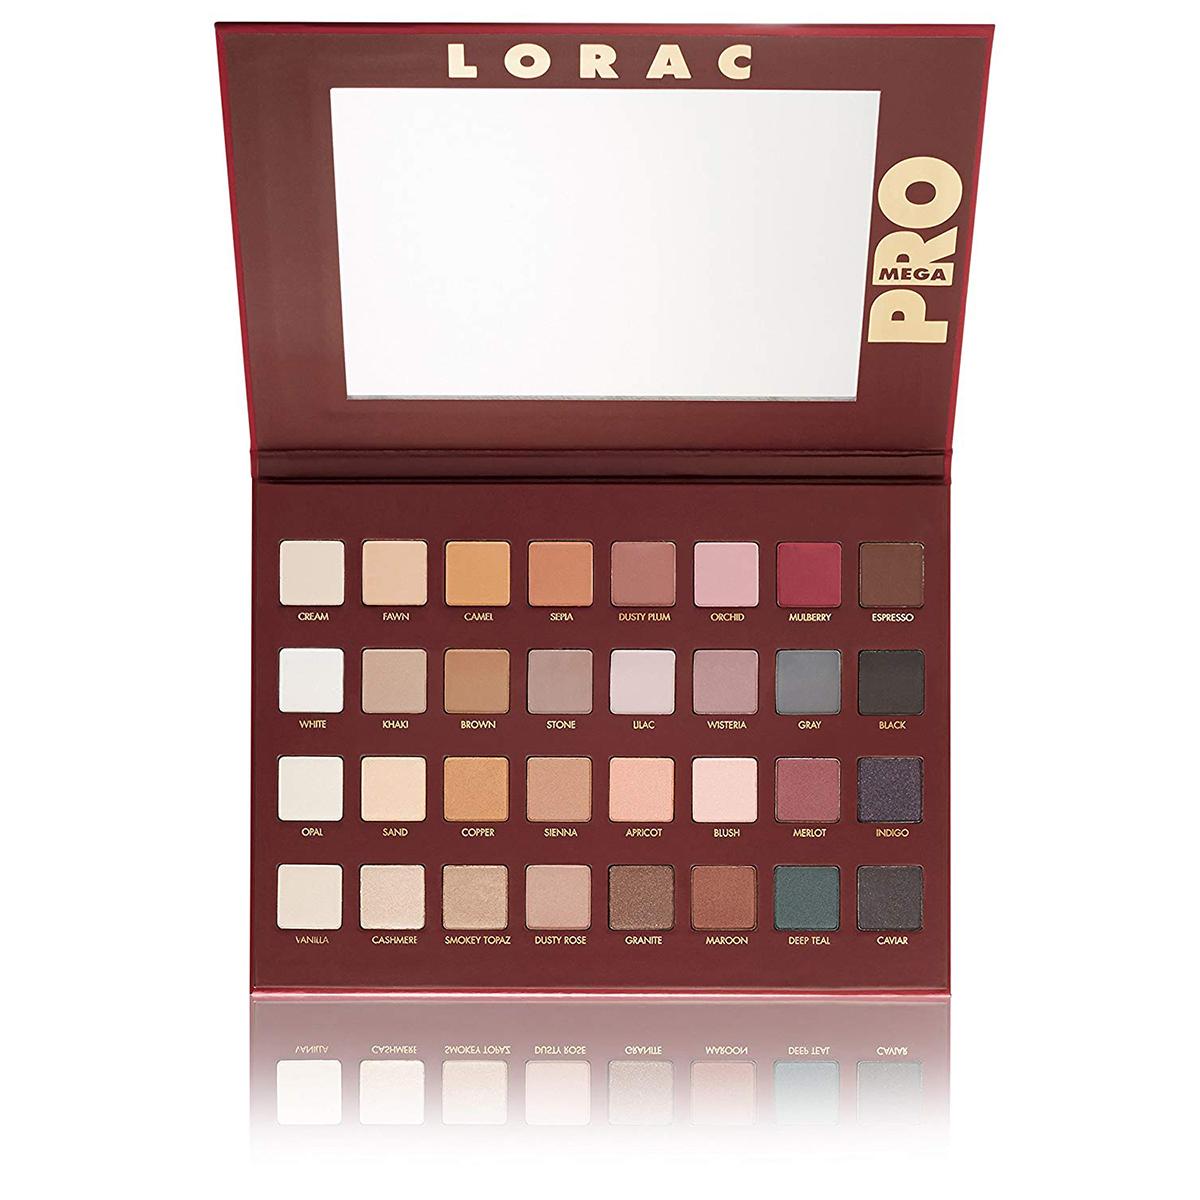 Lorac colors